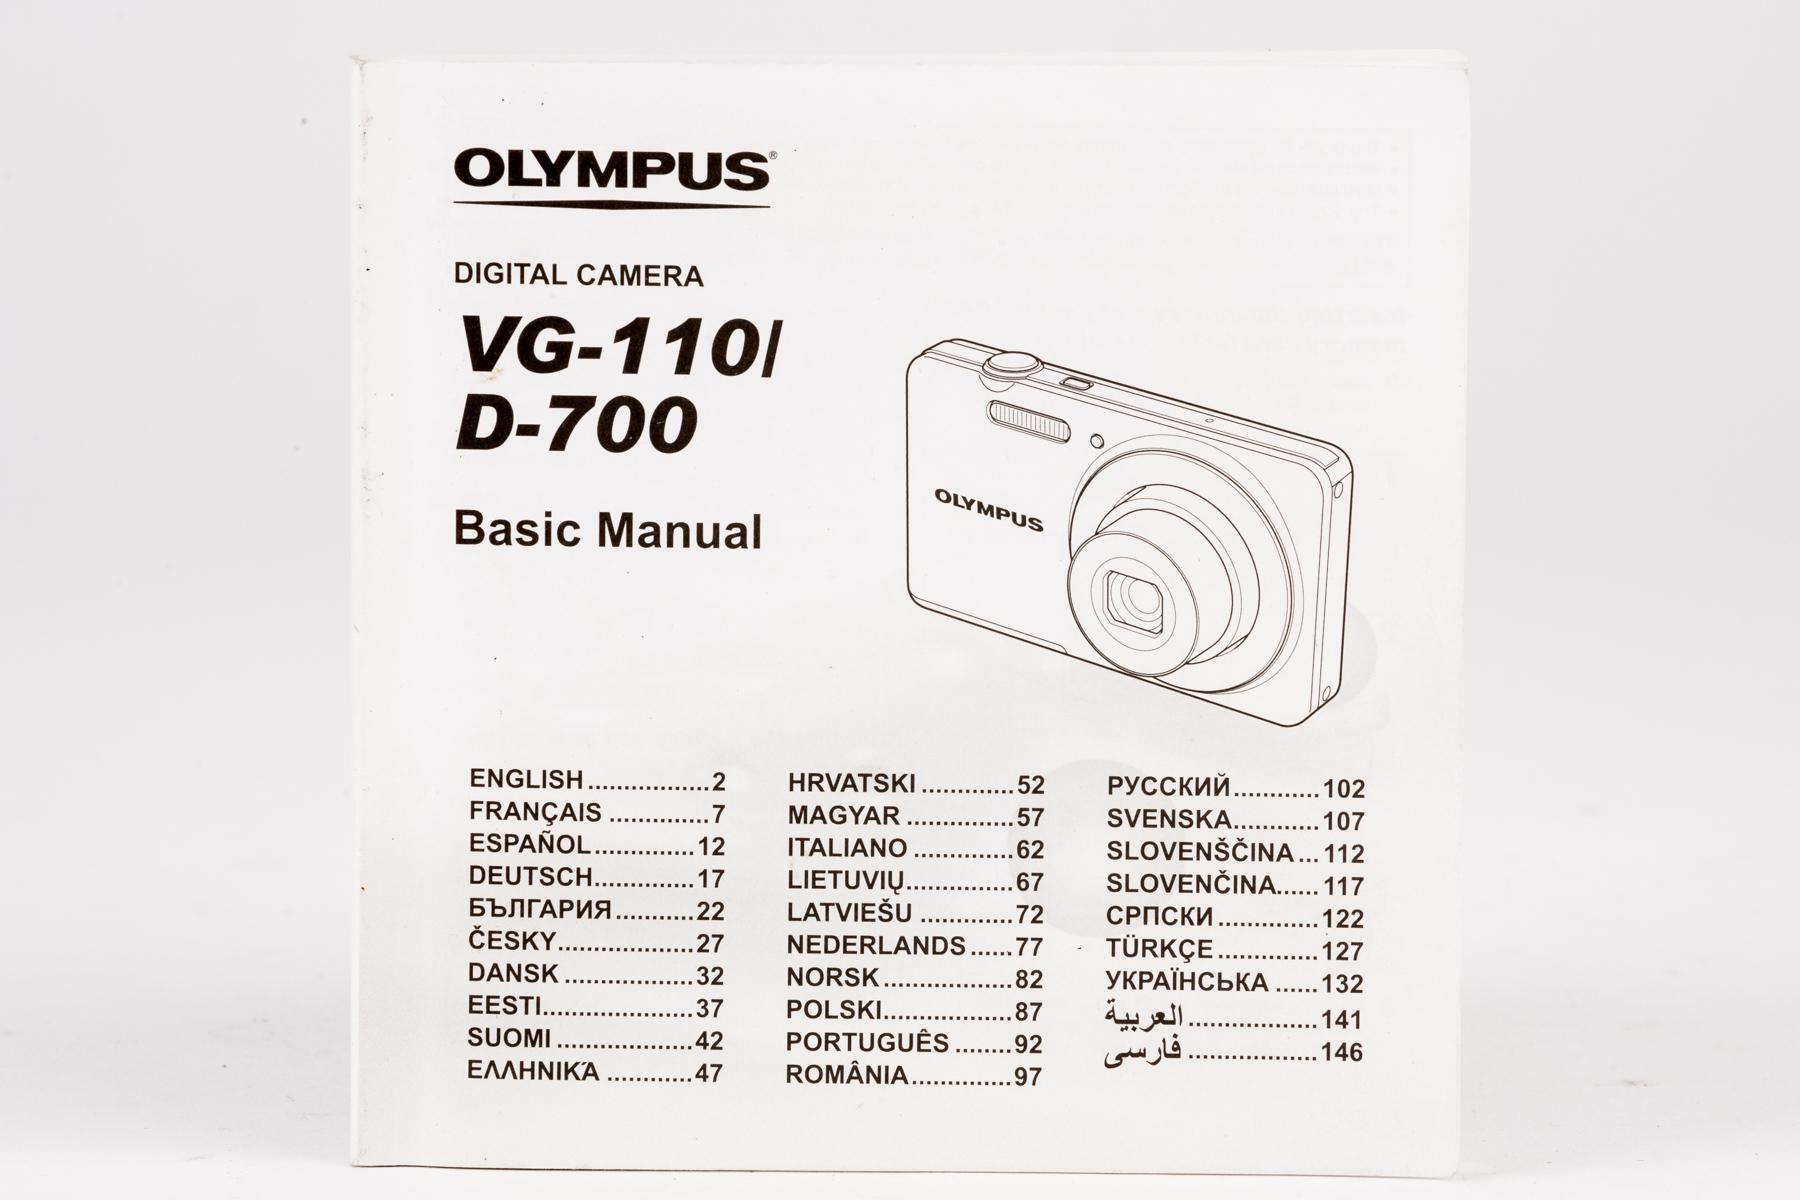 Bedienungsanleitung Olympus Digital Camera VG-110 l D-700